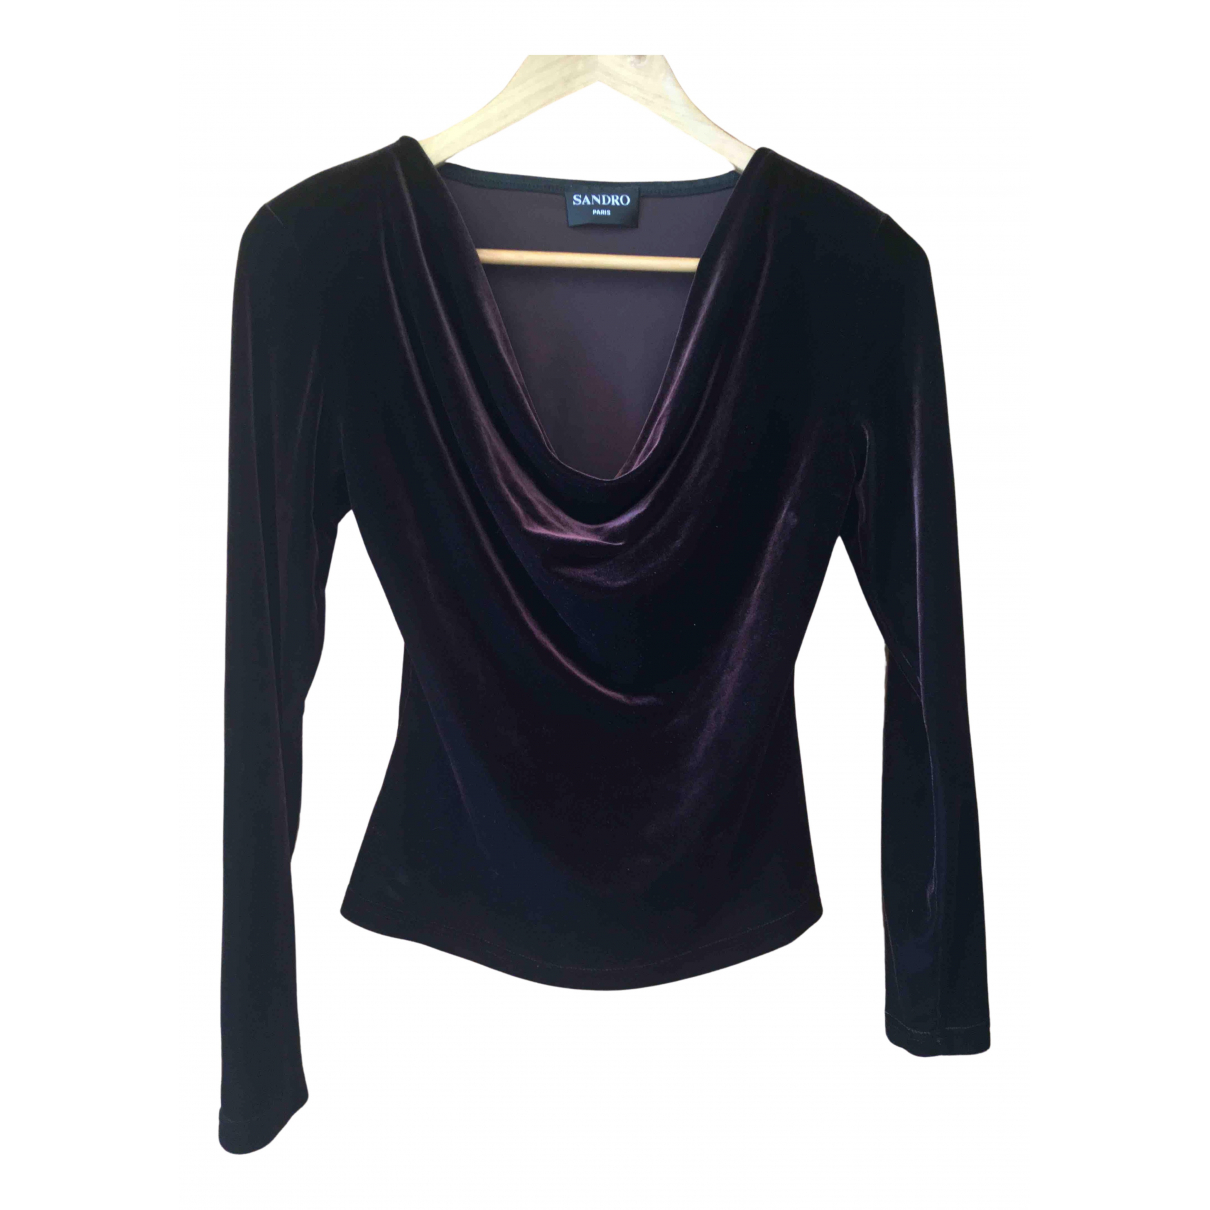 Sandro N Brown Cotton Knitwear for Women 36 FR